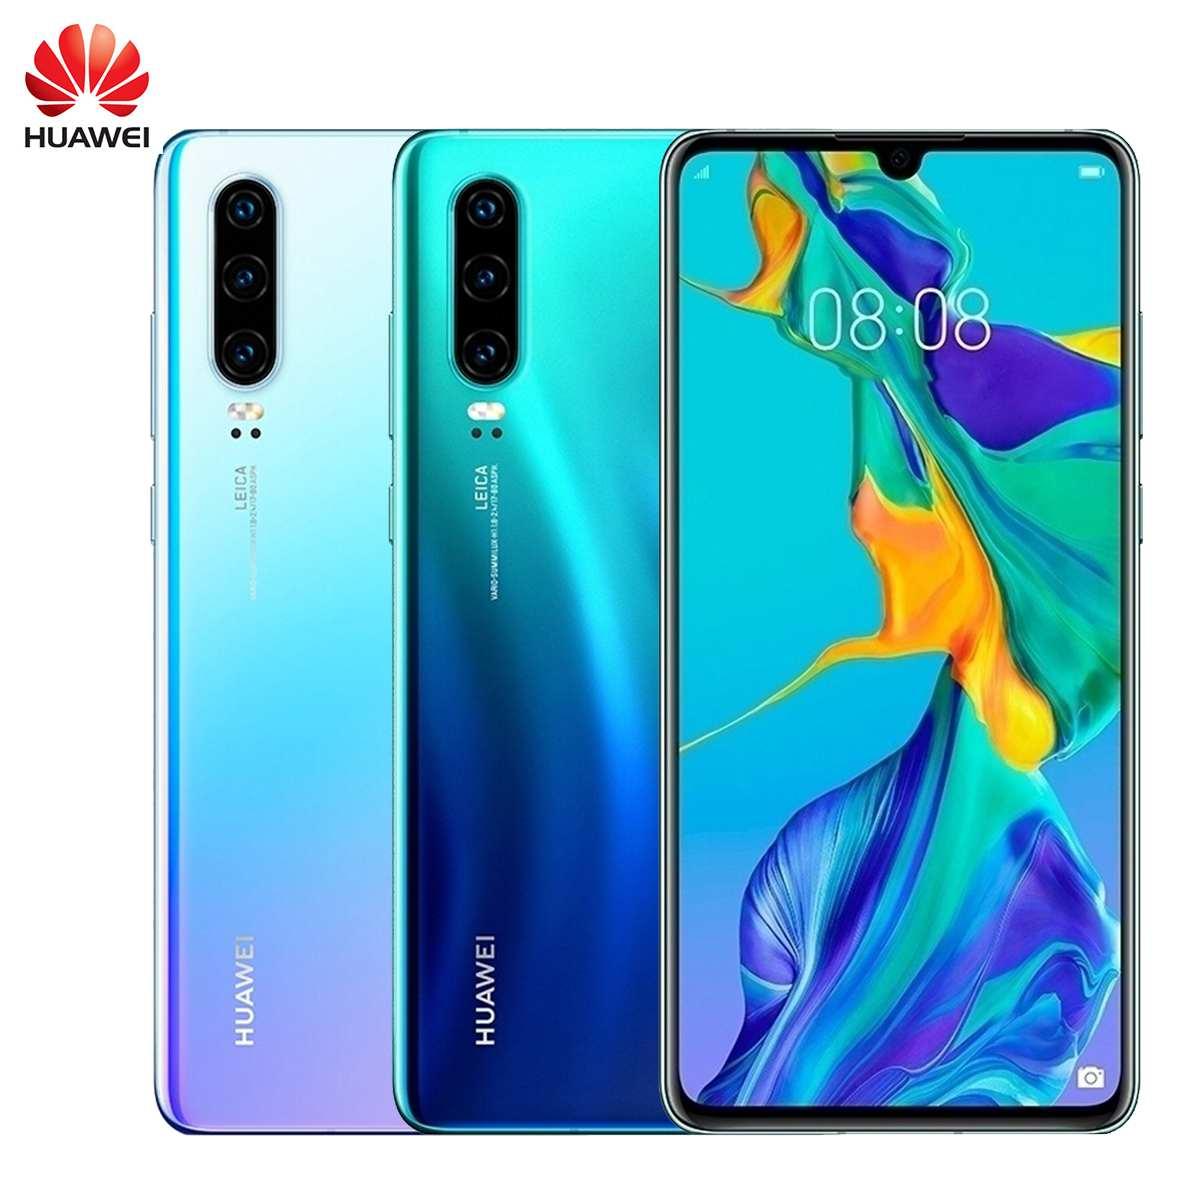 Téléphone portable d'origine HUAWEI P30 128GB + 8GB 6.1 pouces Smartphone Kirin 980 Octa Core Android 9.0 double carte SIM 3650mAh 4 caméras